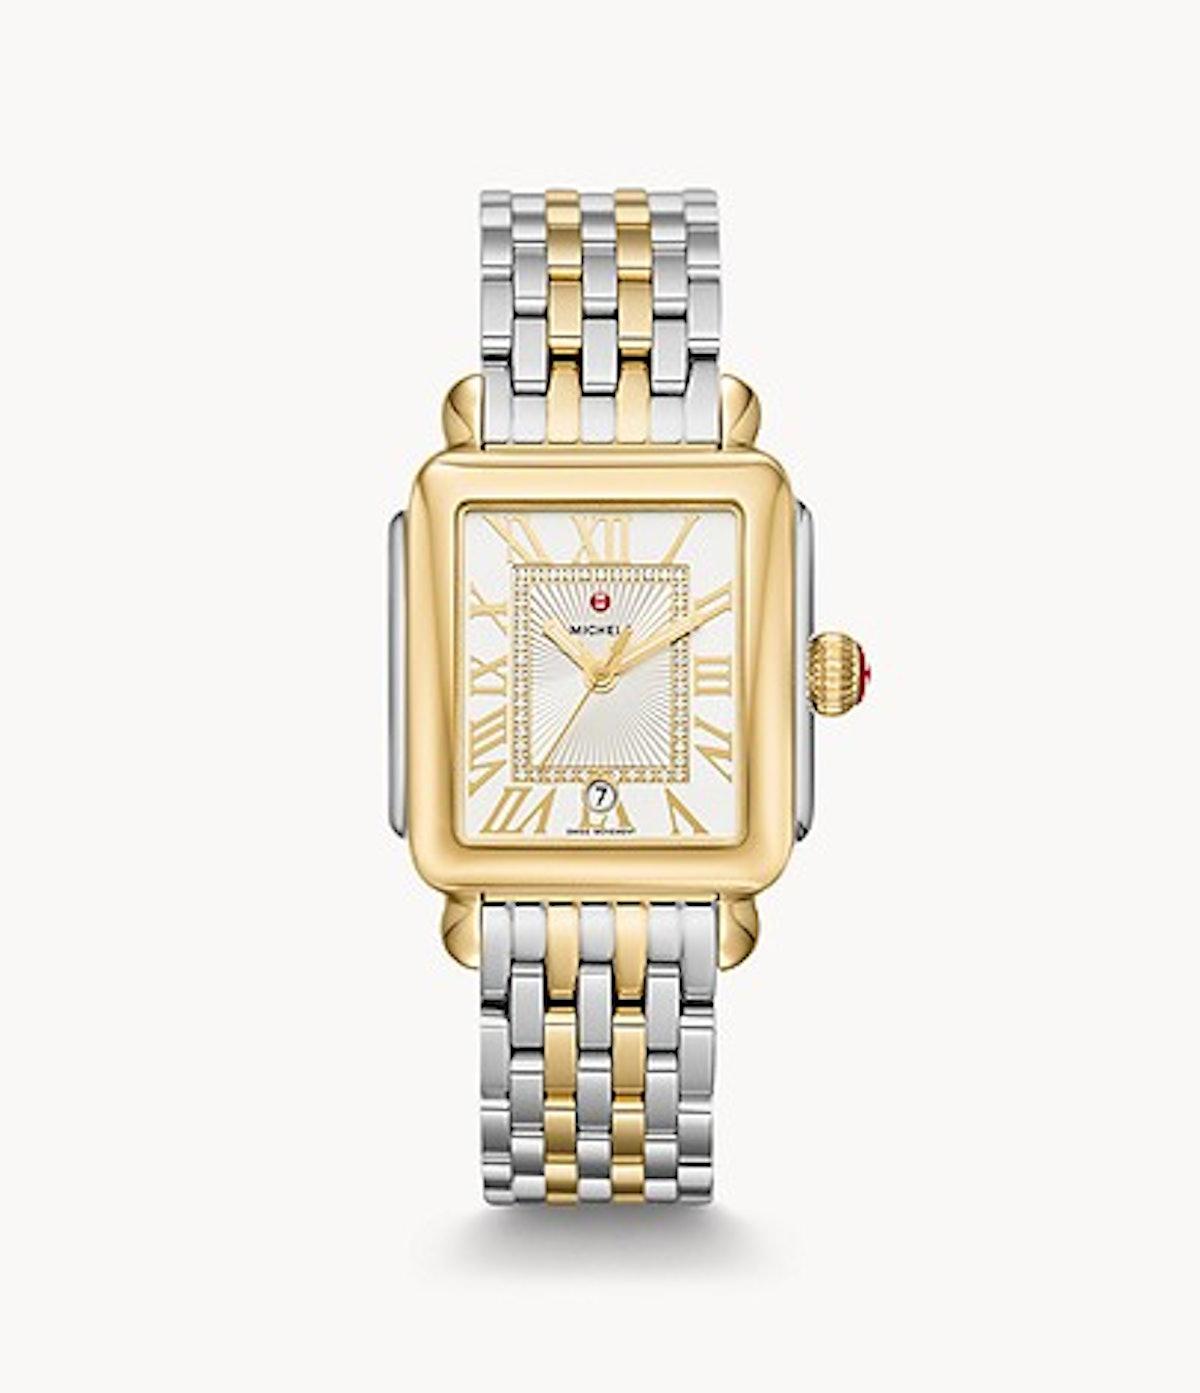 Deco Madison Two-Tone, Diamond Dial Watch